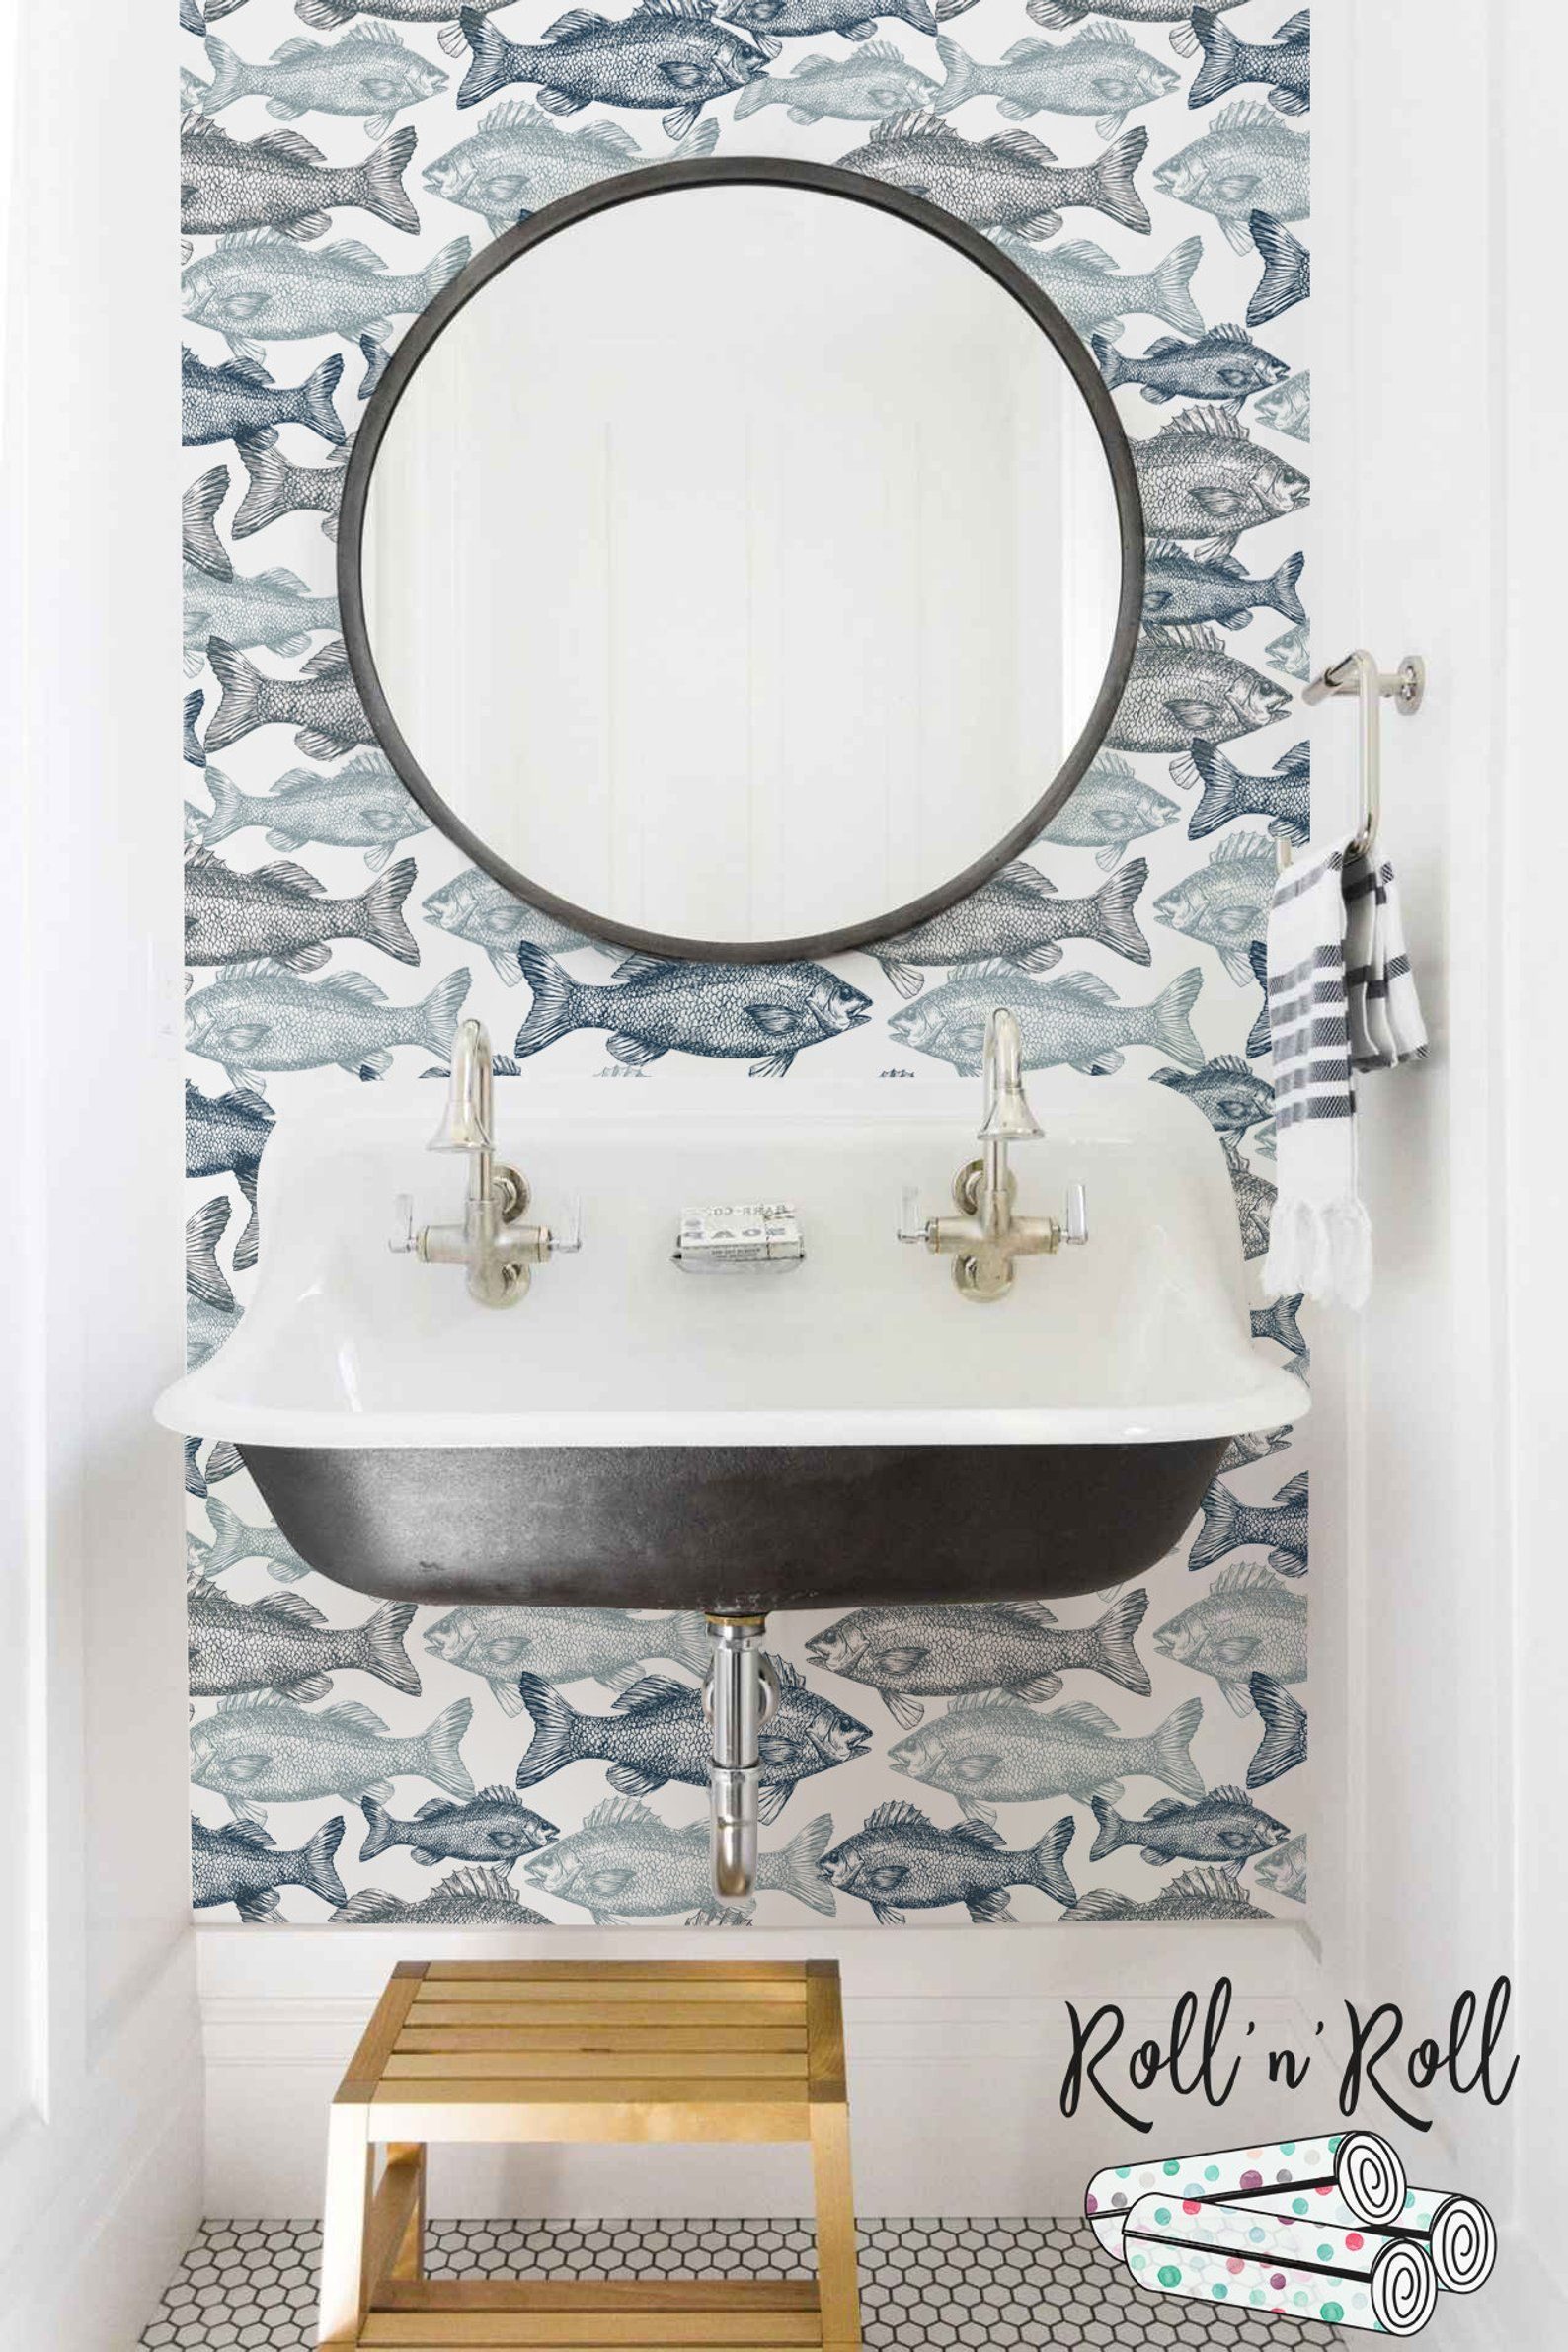 Fish Wallpaper Aqua Wallpaper Removable Wallpaper Or Other Marine Underworld Bathroom Wallpaper 147 In 2020 Bathroom Wallpaper Aqua Wallpaper Fish Wallpaper